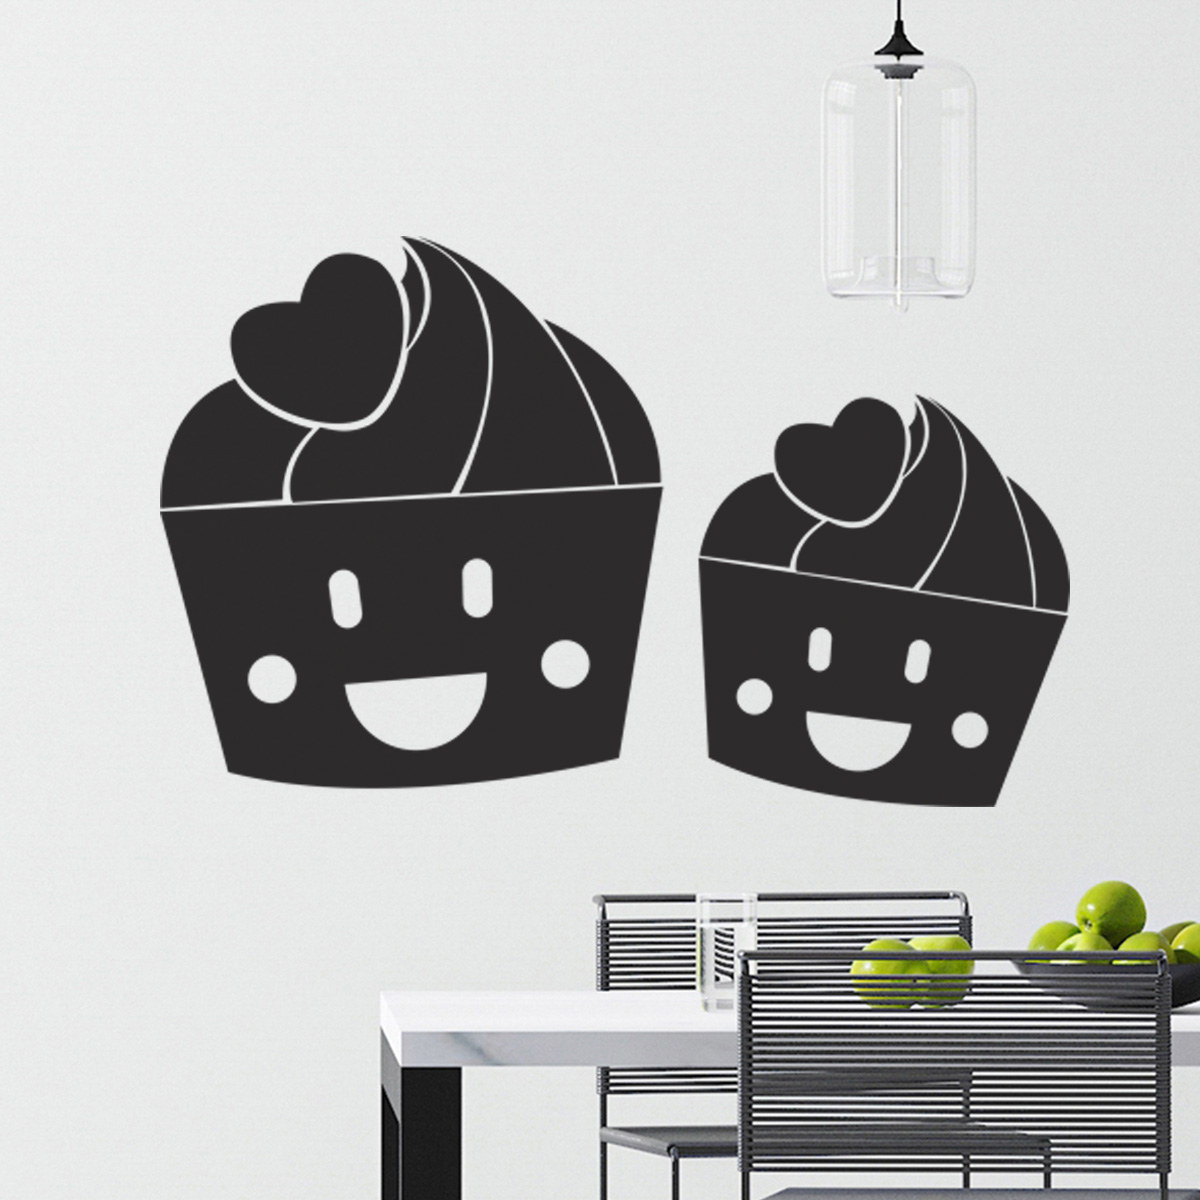 Adesivo de Cozinha CupCakes